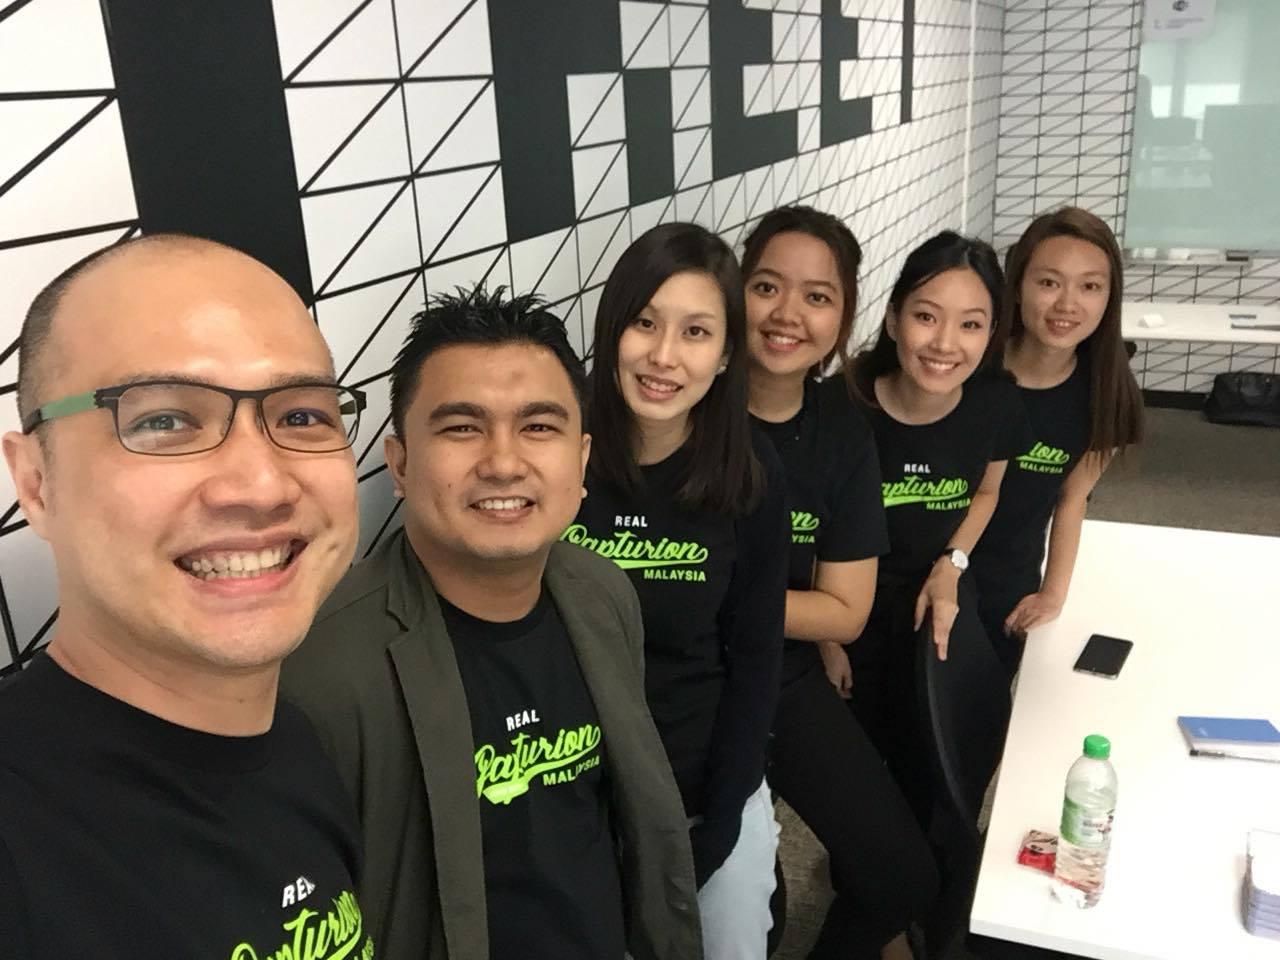 Gapturions: (From left to right) Stanley Chee, Amirul Faisyal, Jilian Liew, Erra Fazira, Nadine Ong (intern) and Loh Sook Yee (intern).